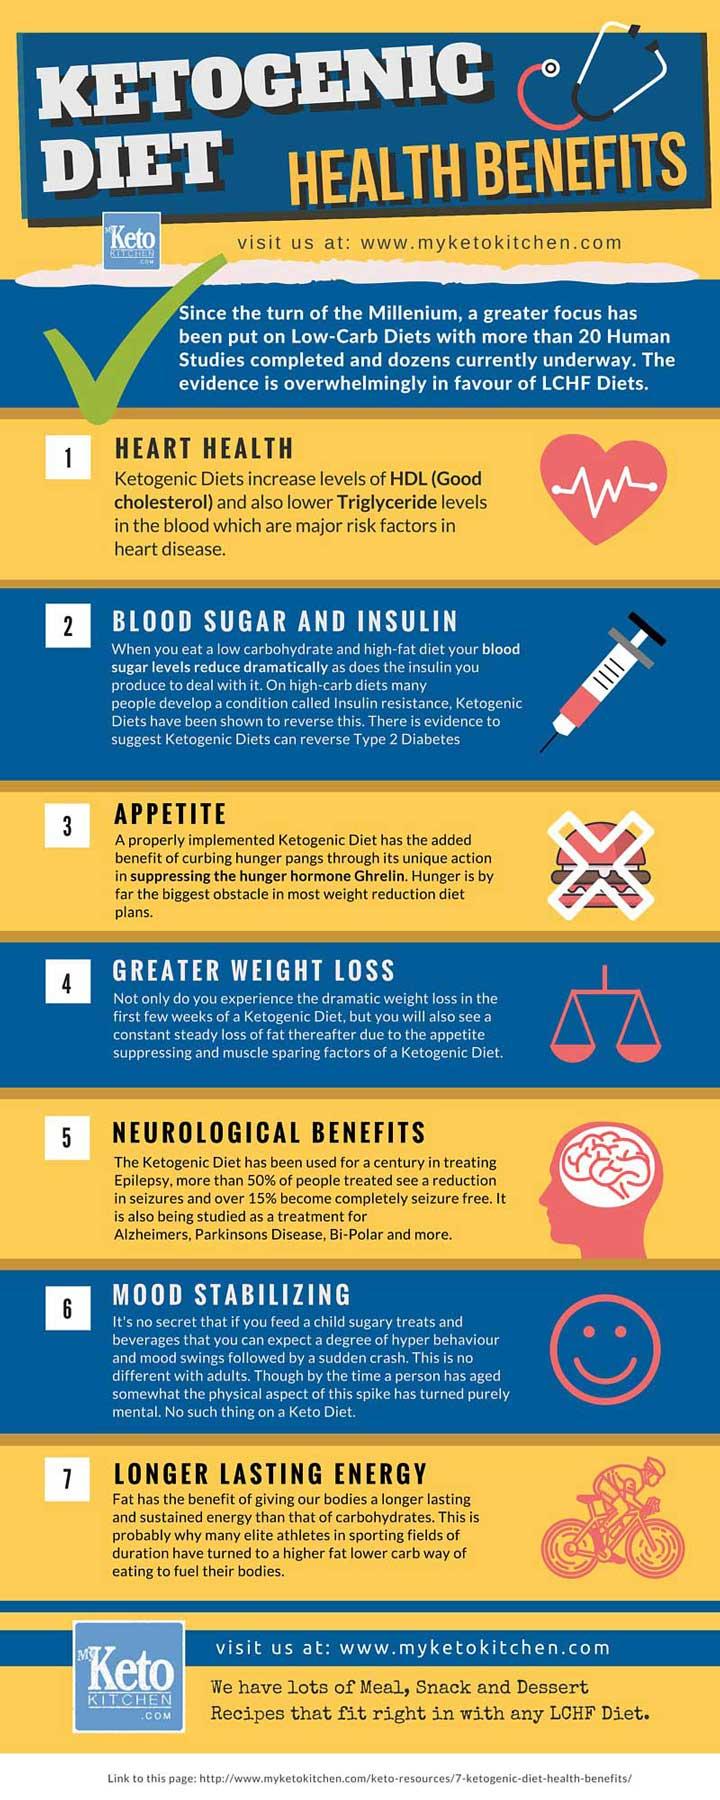 Ketogenic-Diet-Health-Benefits-infographic